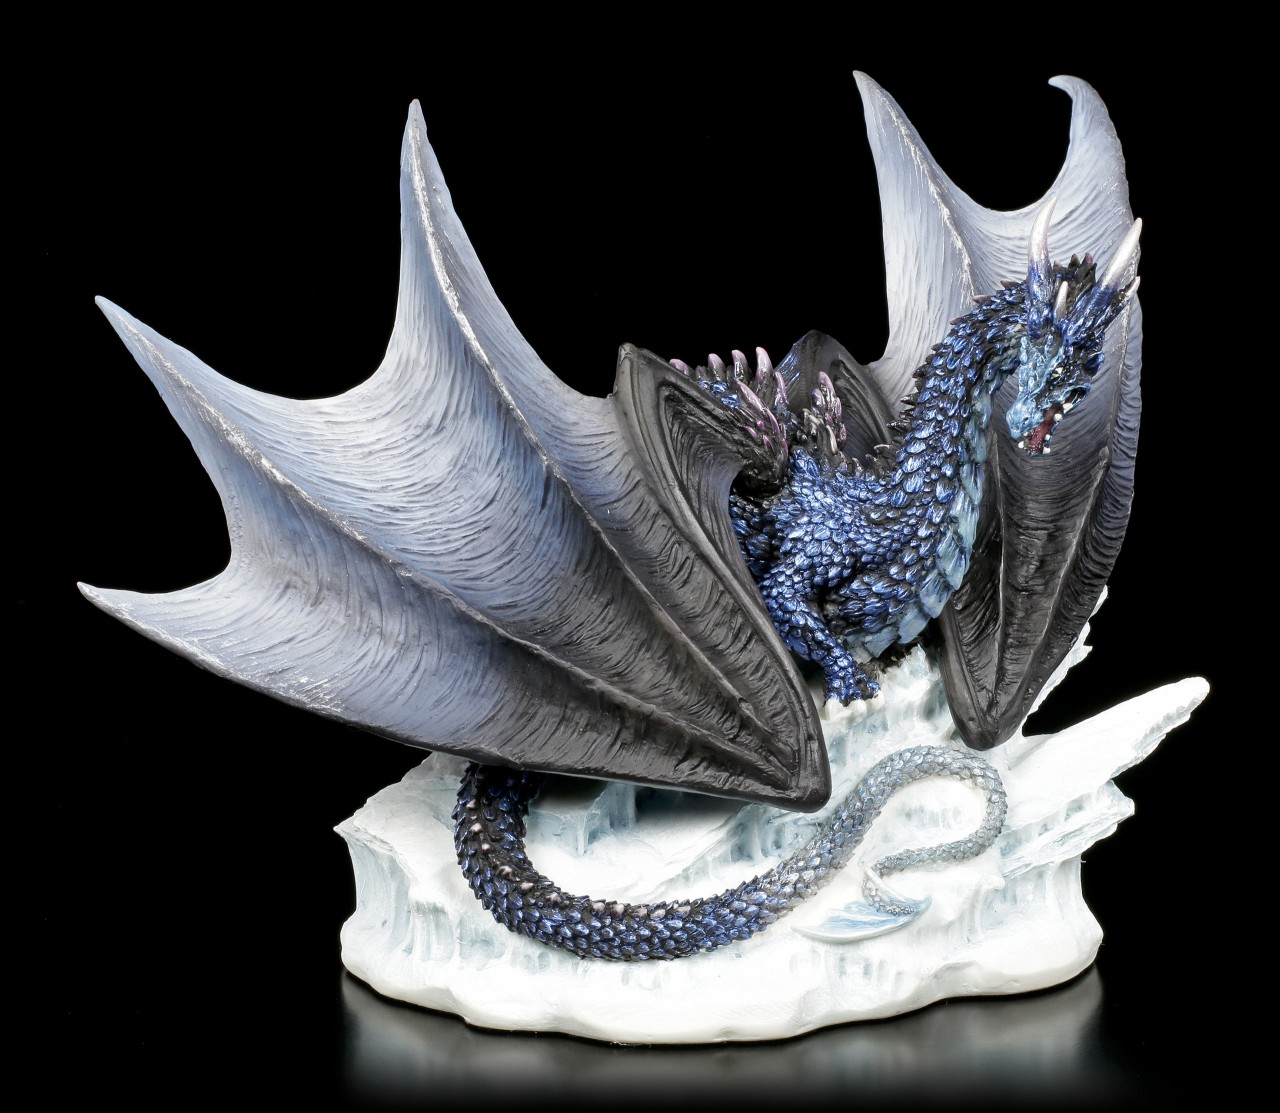 Dragon Figurine - Buran on Iceberg